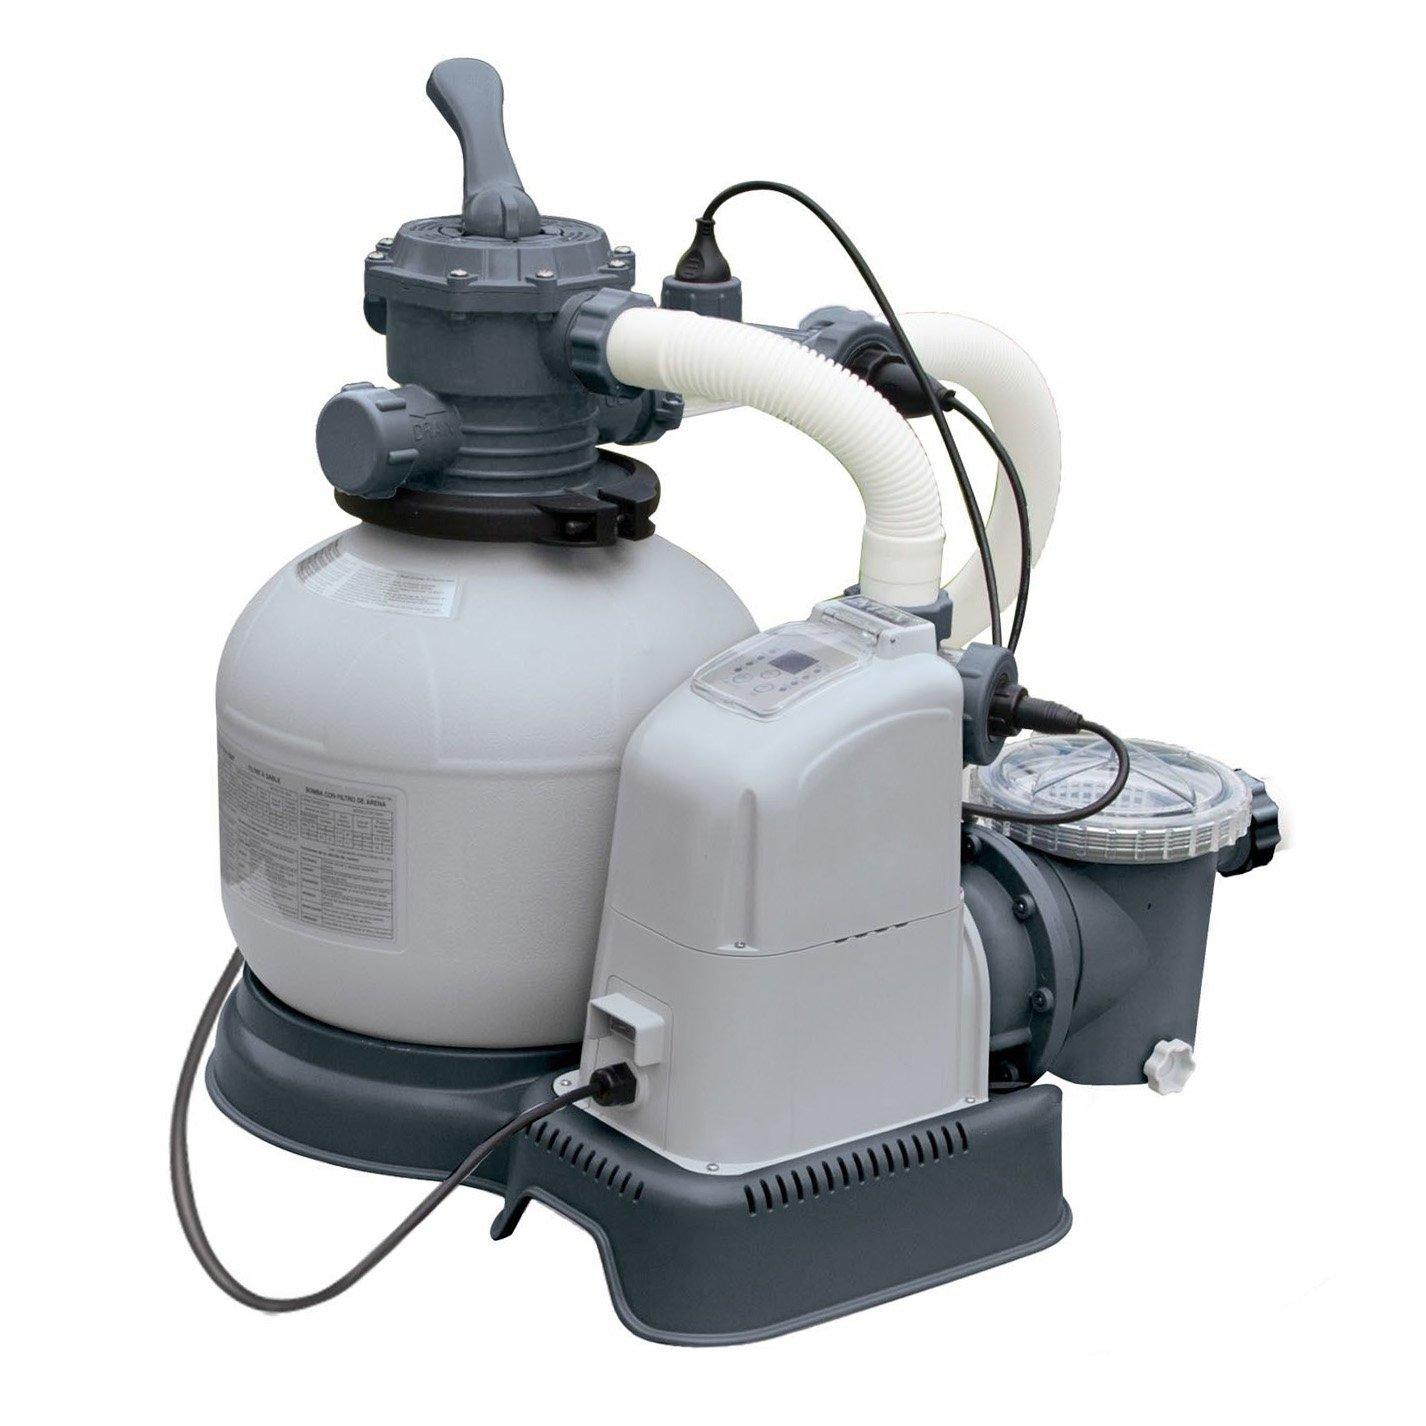 Intex 2100 GPH Krystal Clear Sand Filter Swimming Pool Pump   28645EG